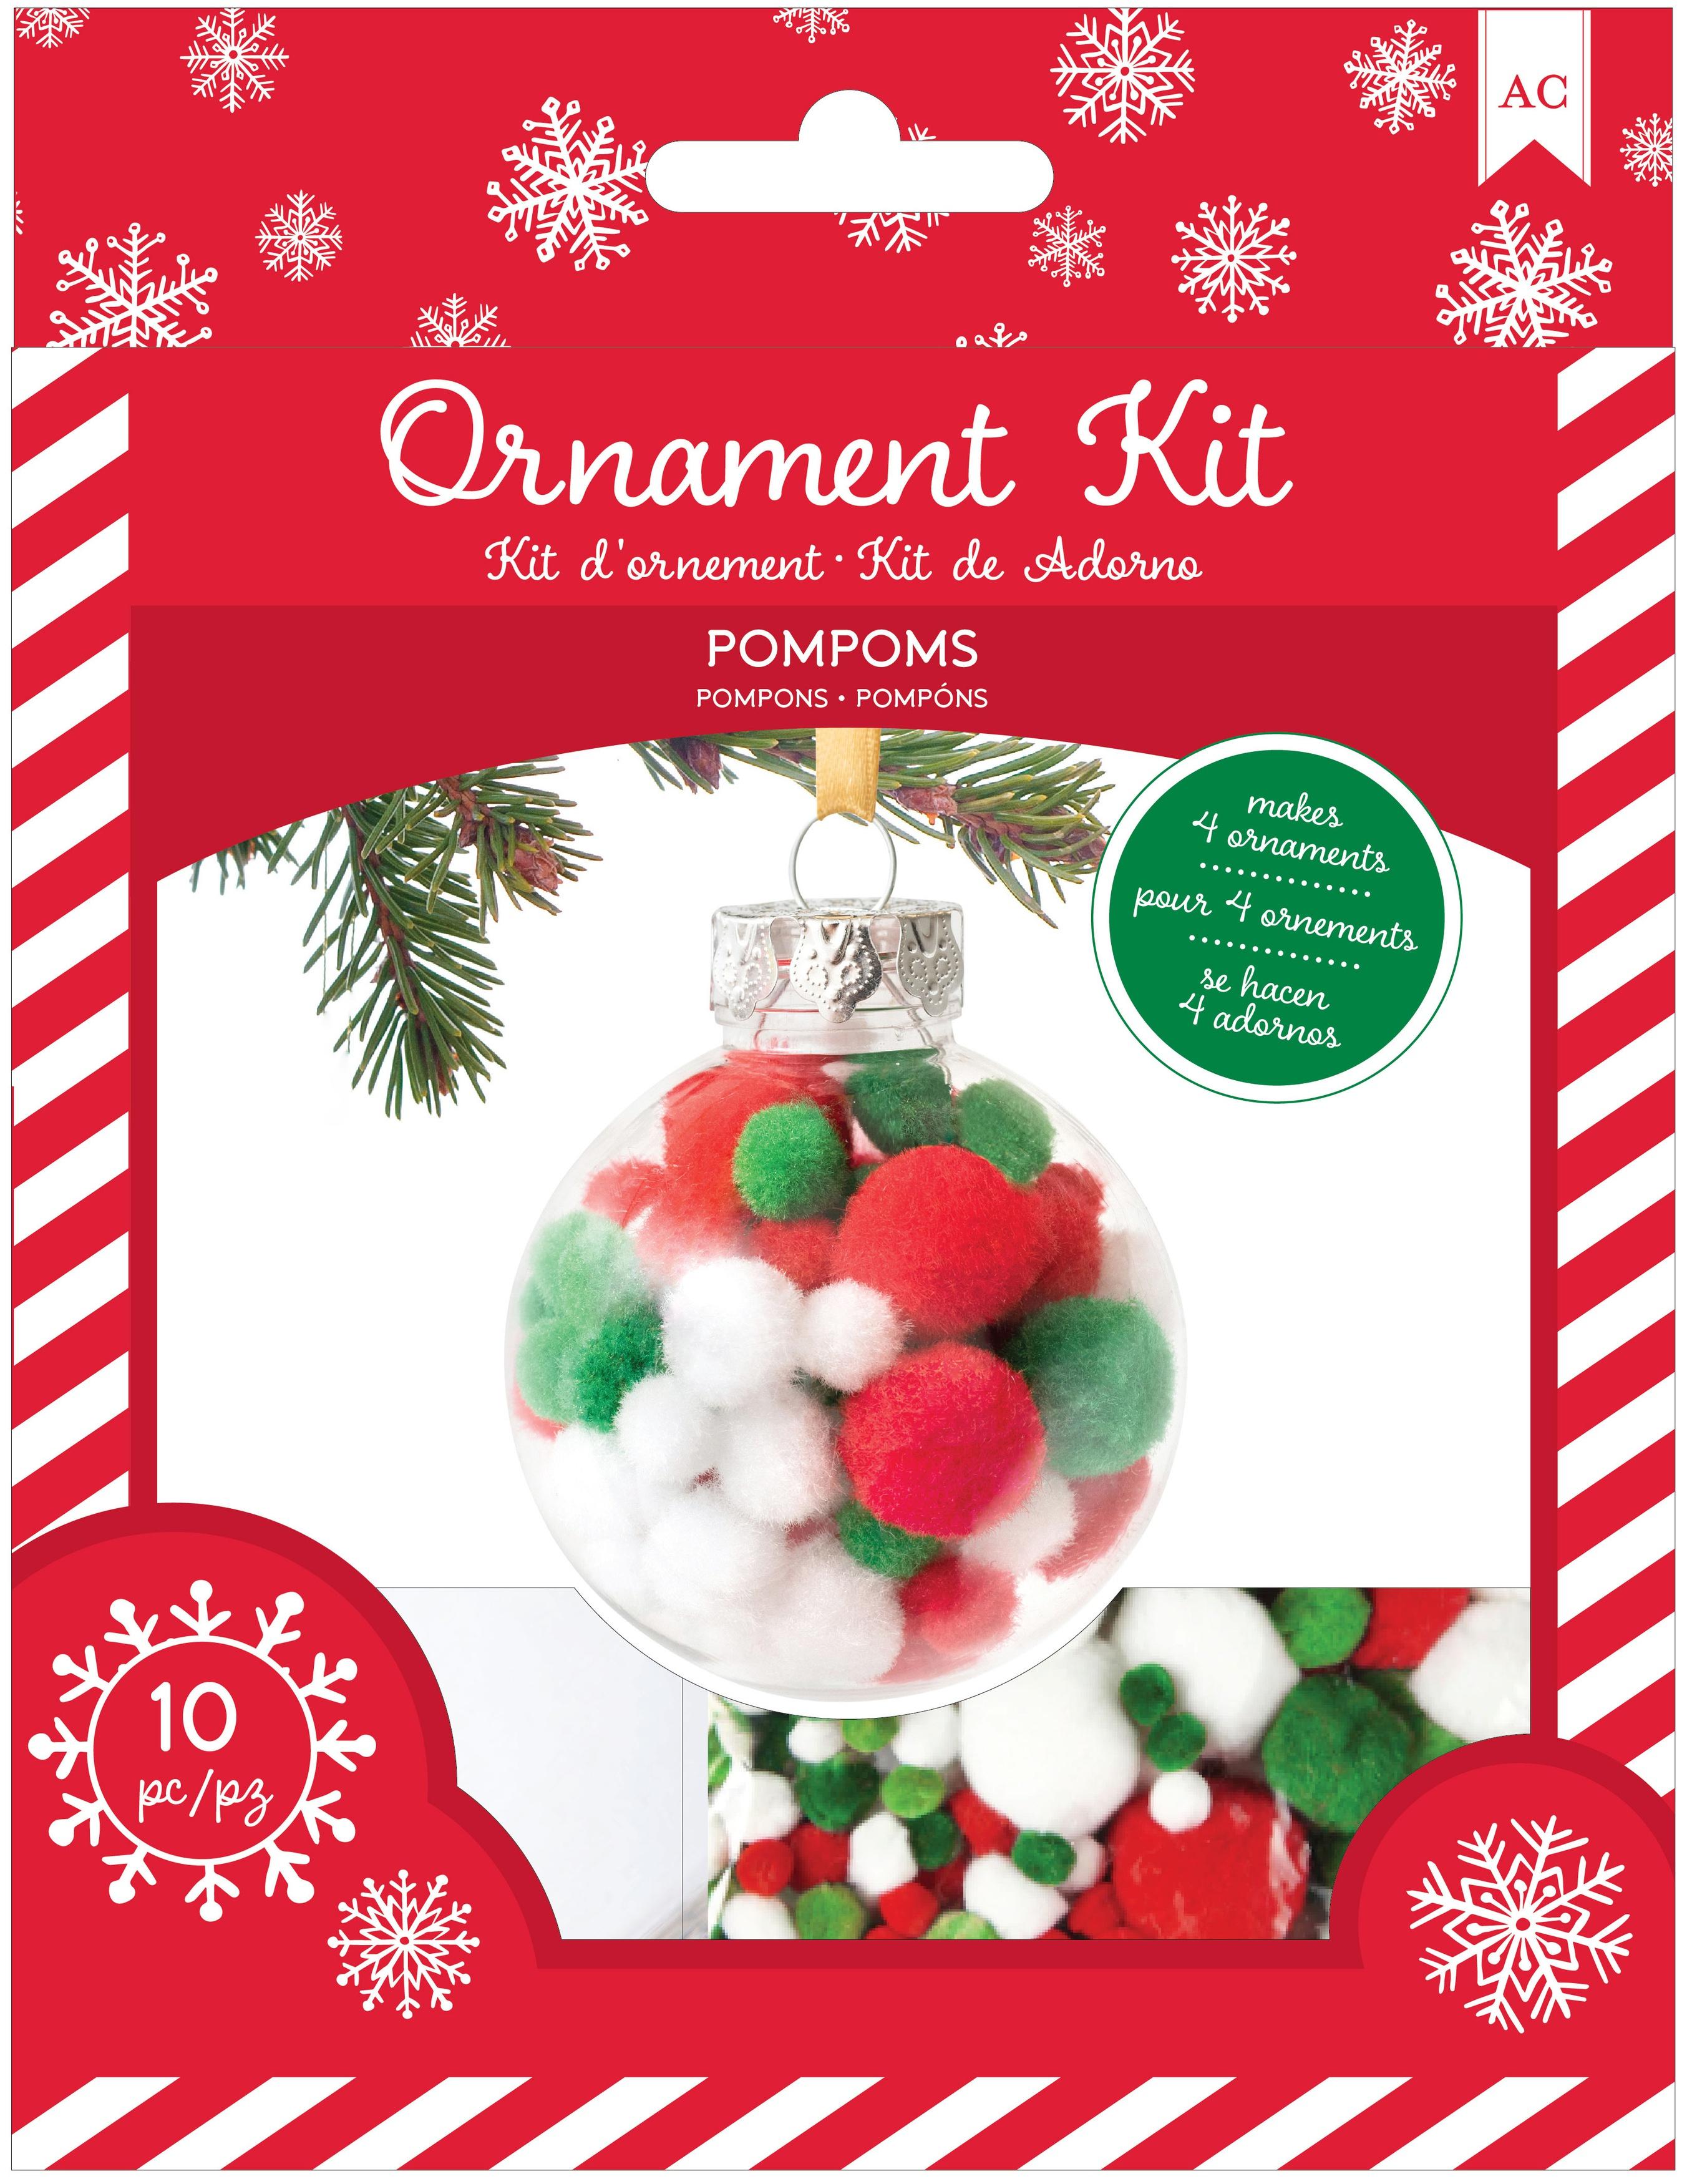 AC Christmas Ornament Kit 4/Pkg-Pom Poms